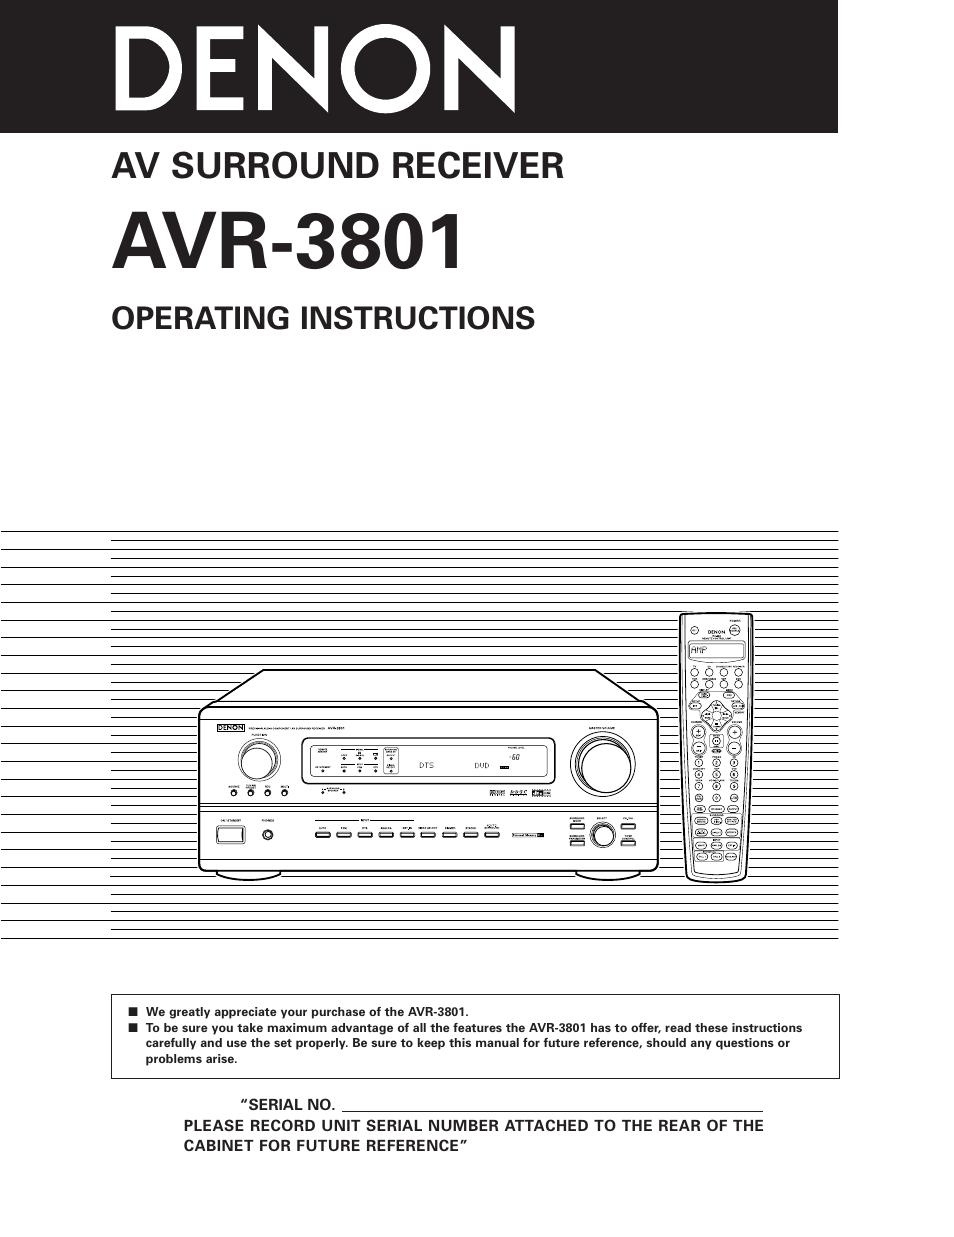 denon avr 3801 user manual 72 pages rh manualsdir com denon avr-3300 instruction manual denon rcd-m39dab instruction manual